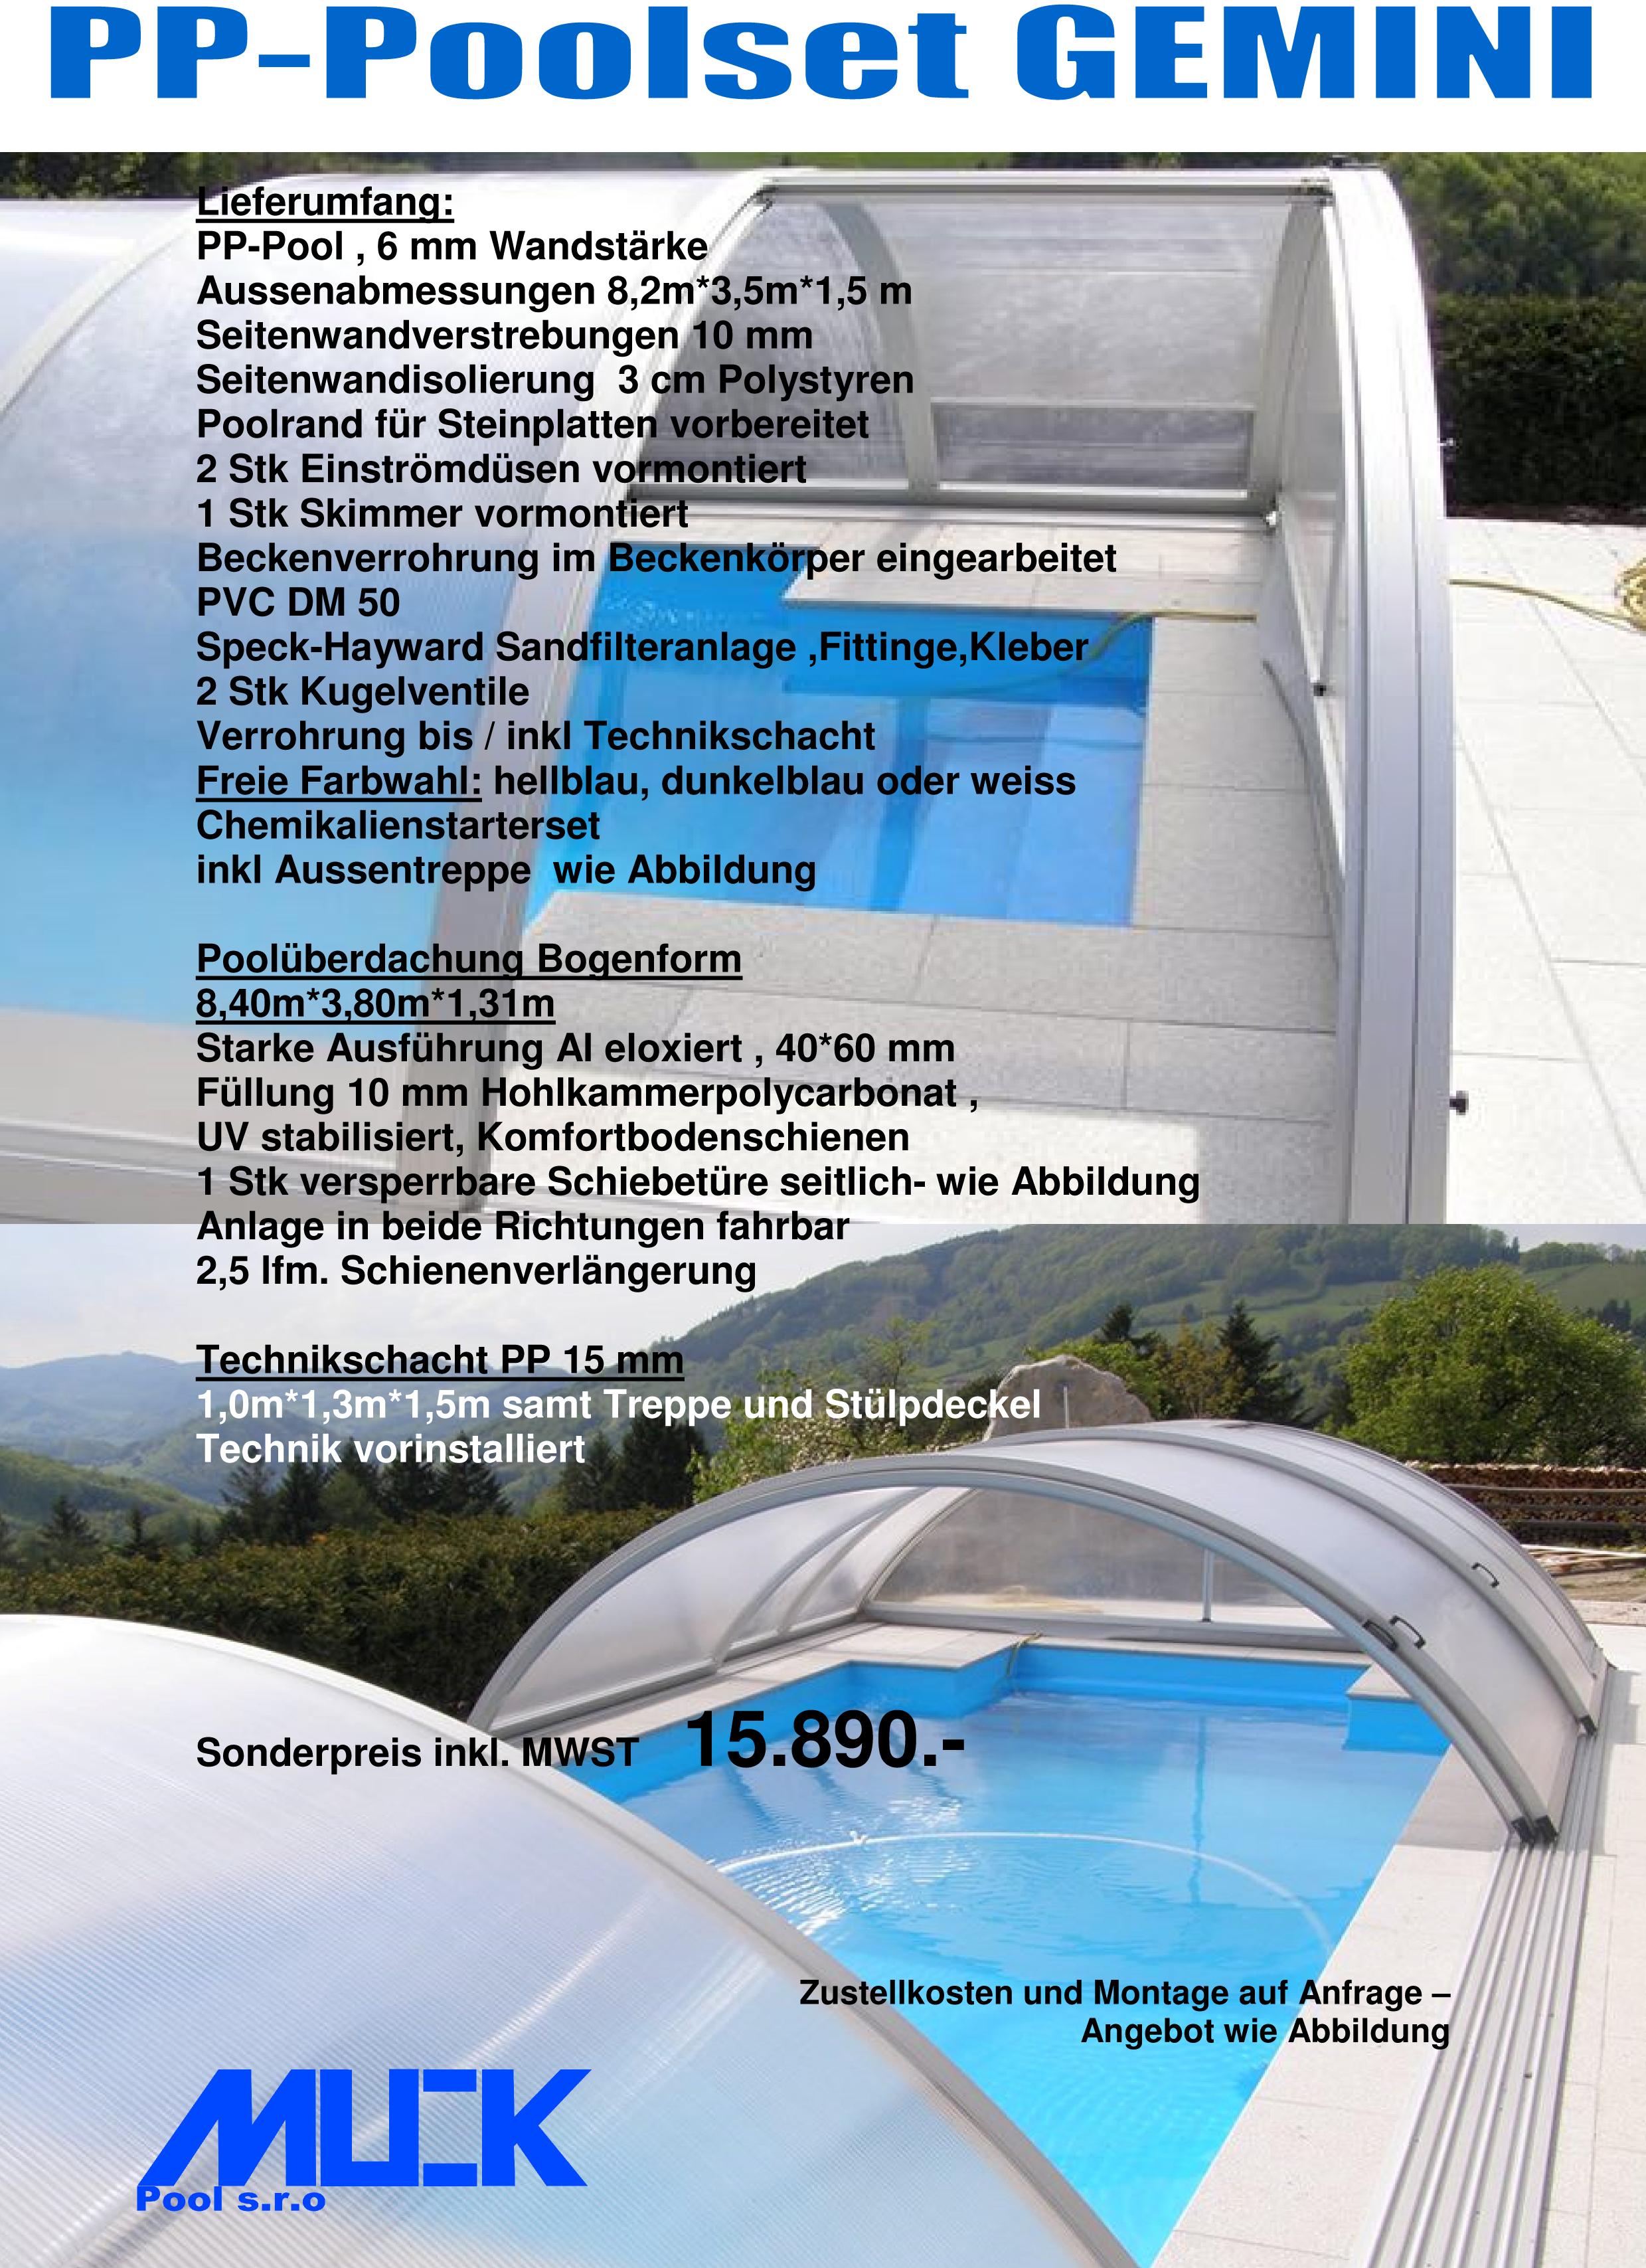 polyester pool set schwimmbad und saunen. Black Bedroom Furniture Sets. Home Design Ideas